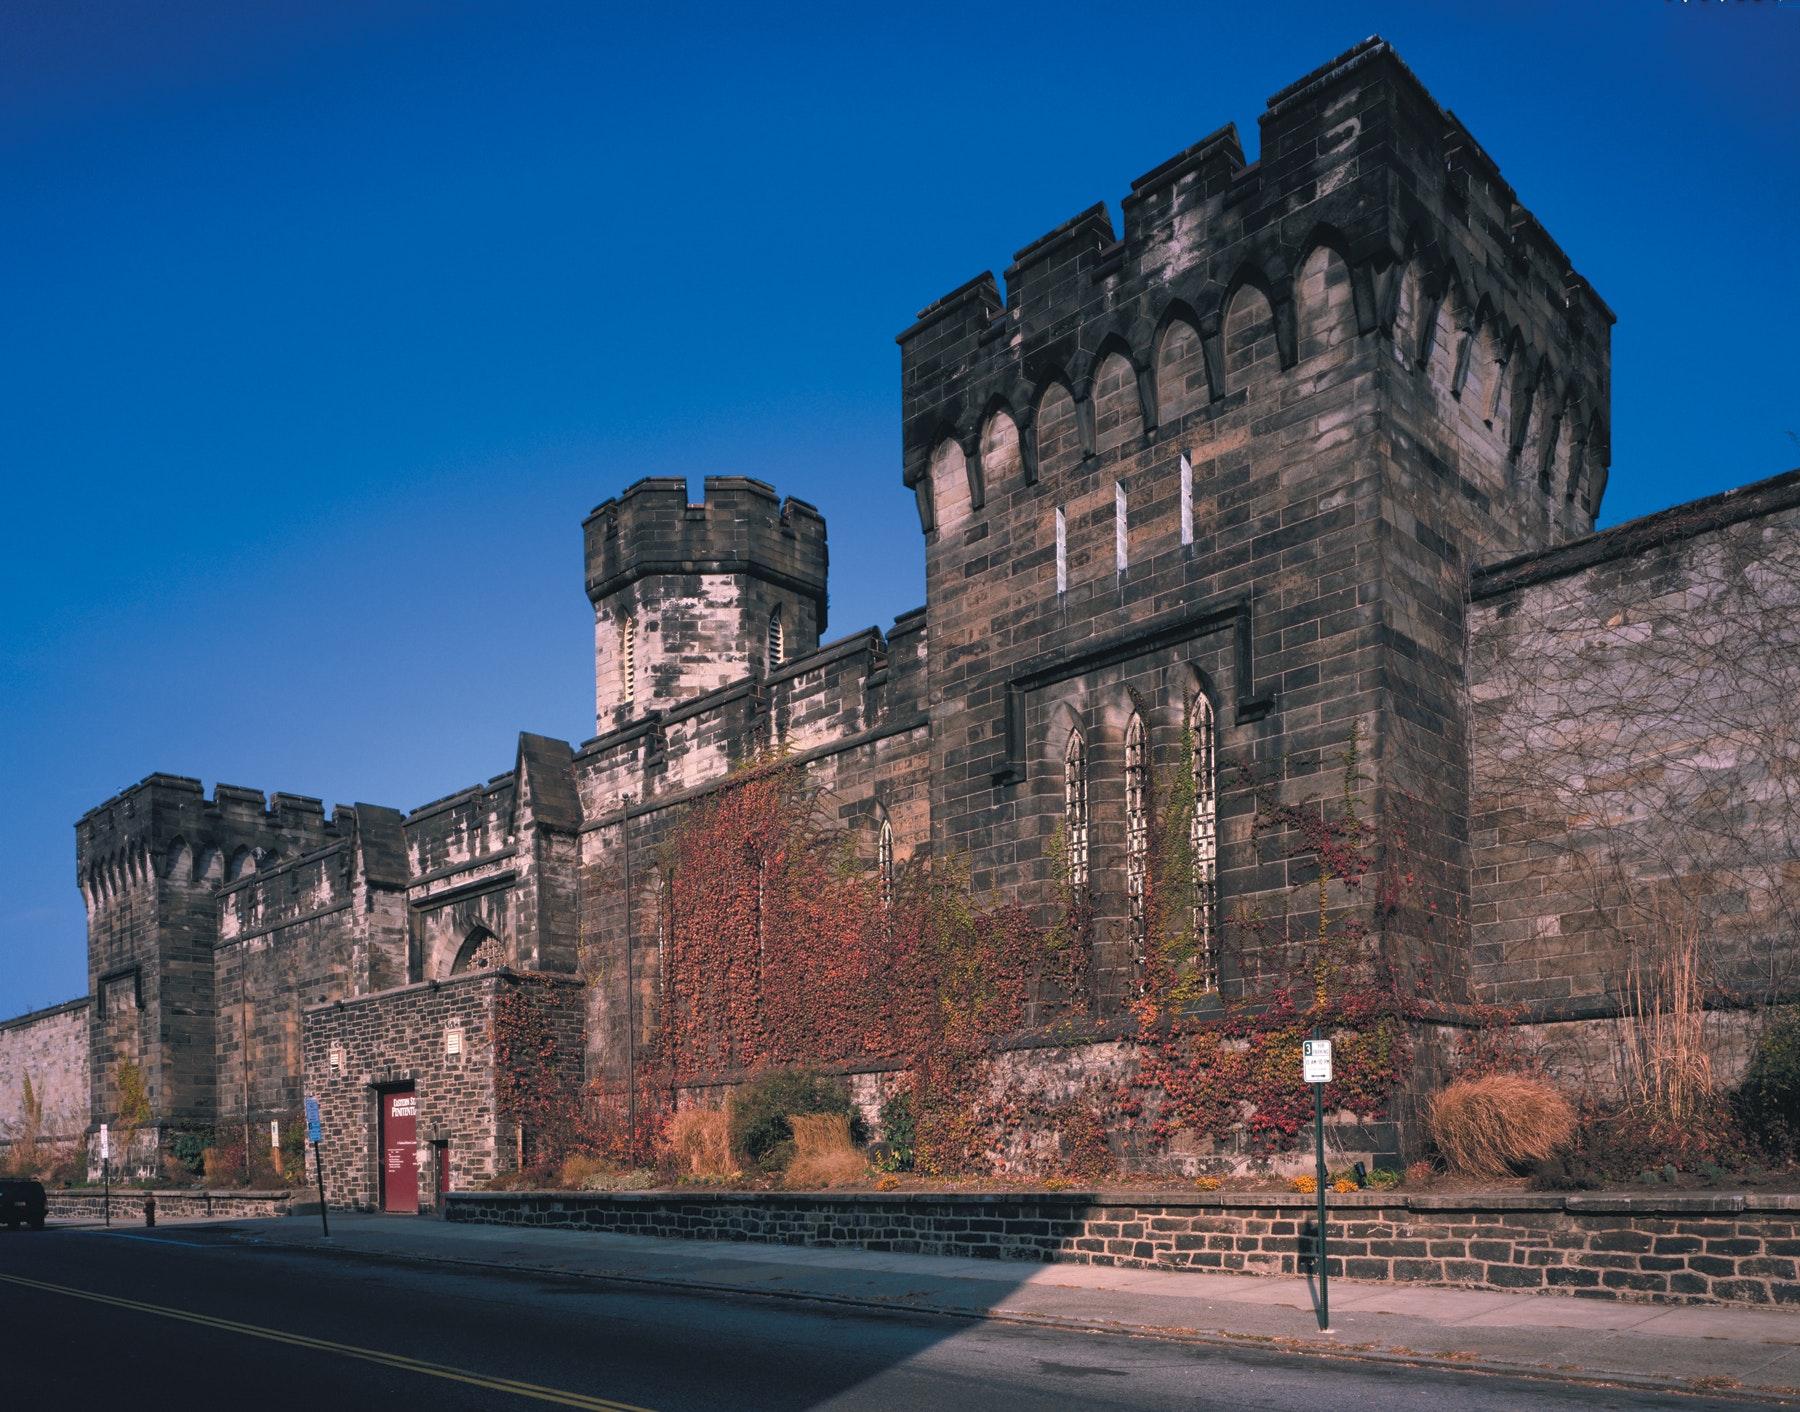 <p>Eastern State Penitentiary. Photo byAlbert Vecerka.</p>